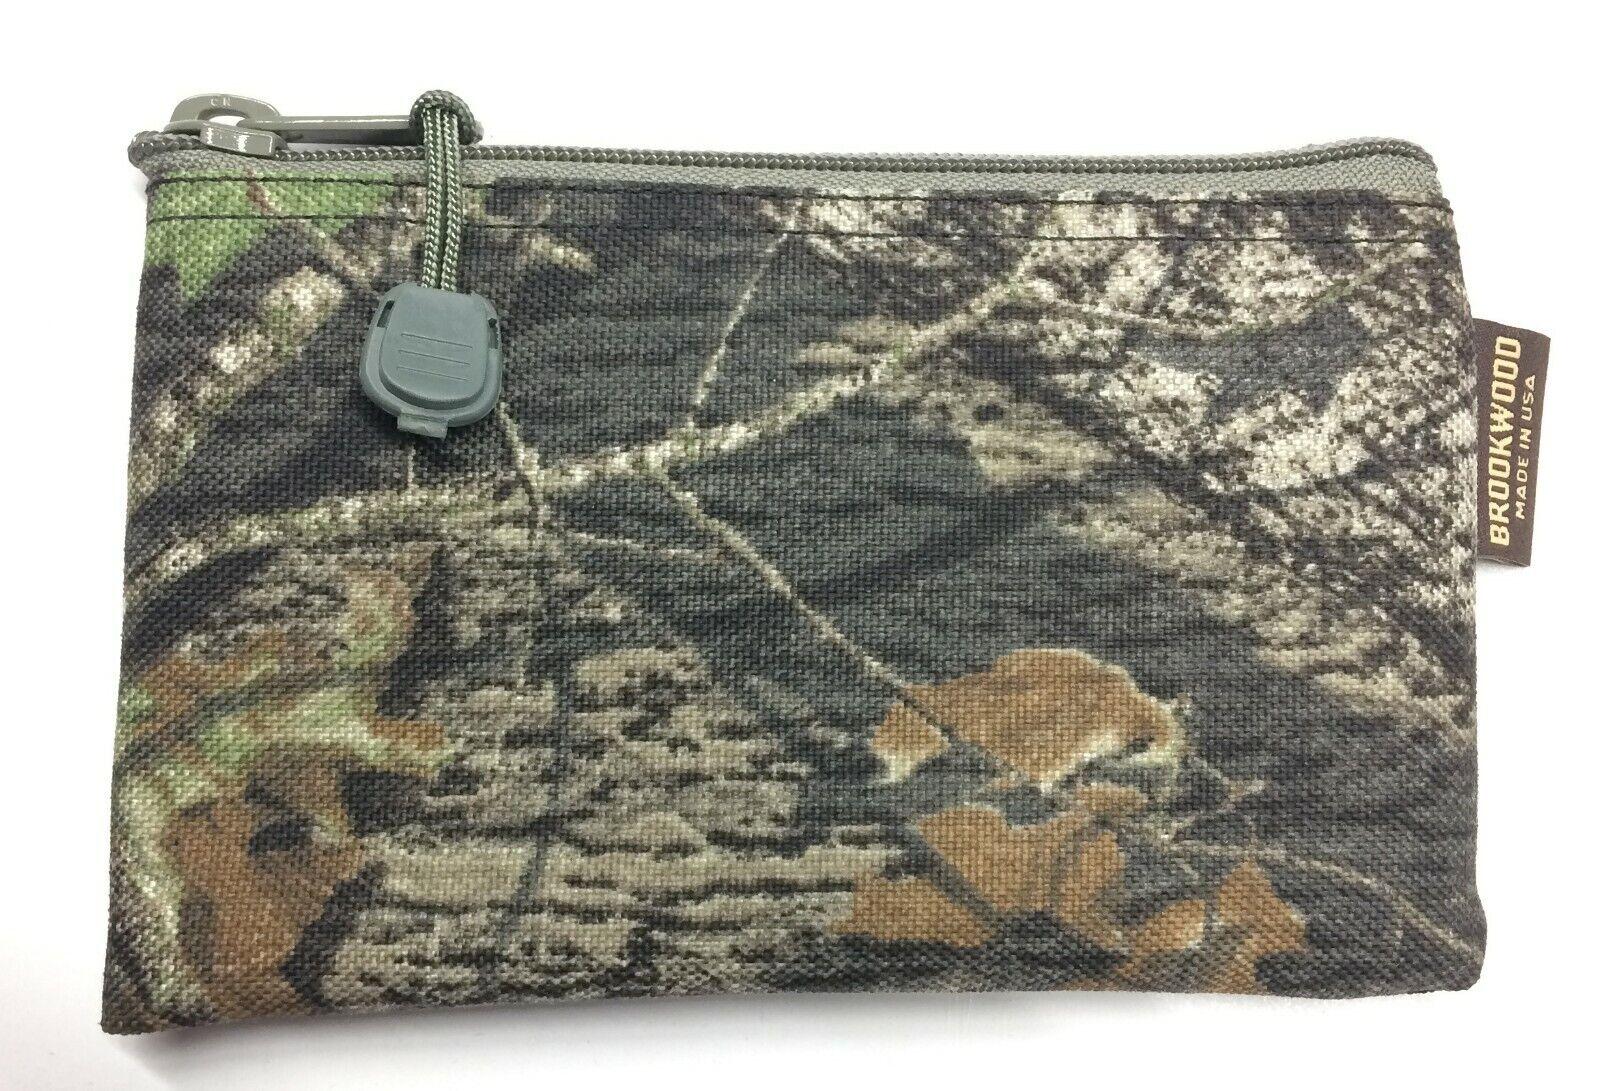 2 pcs. Mossy Oak Cordura Zipper Tool Bag Small size 4 x 7 In